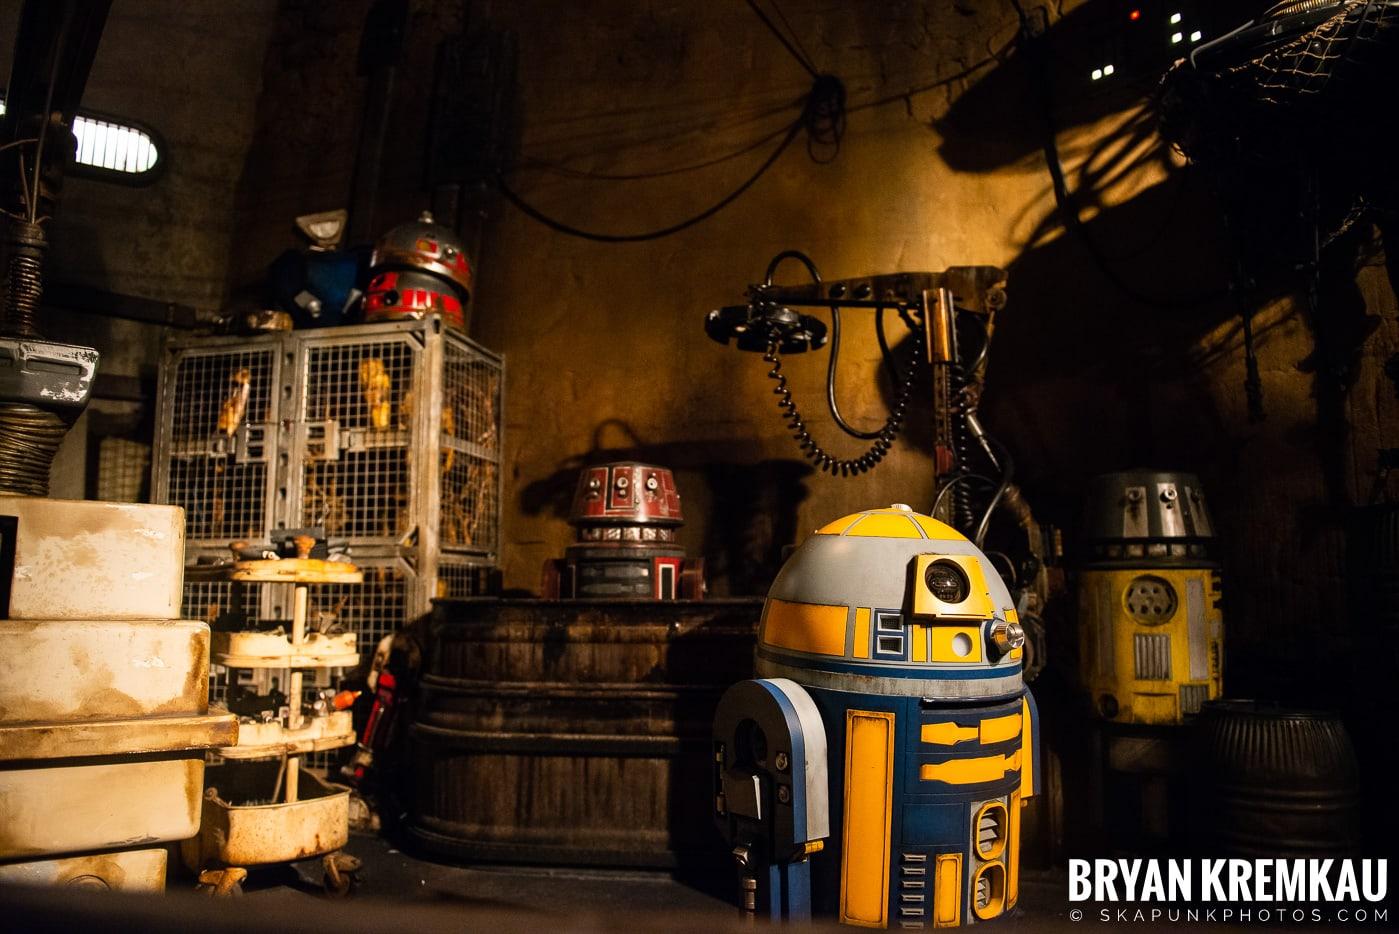 Walt Disney World Vacation: Day 5 (Animal Kingdom / Disney's Hollywood Studios) - 10.3.19 (3)